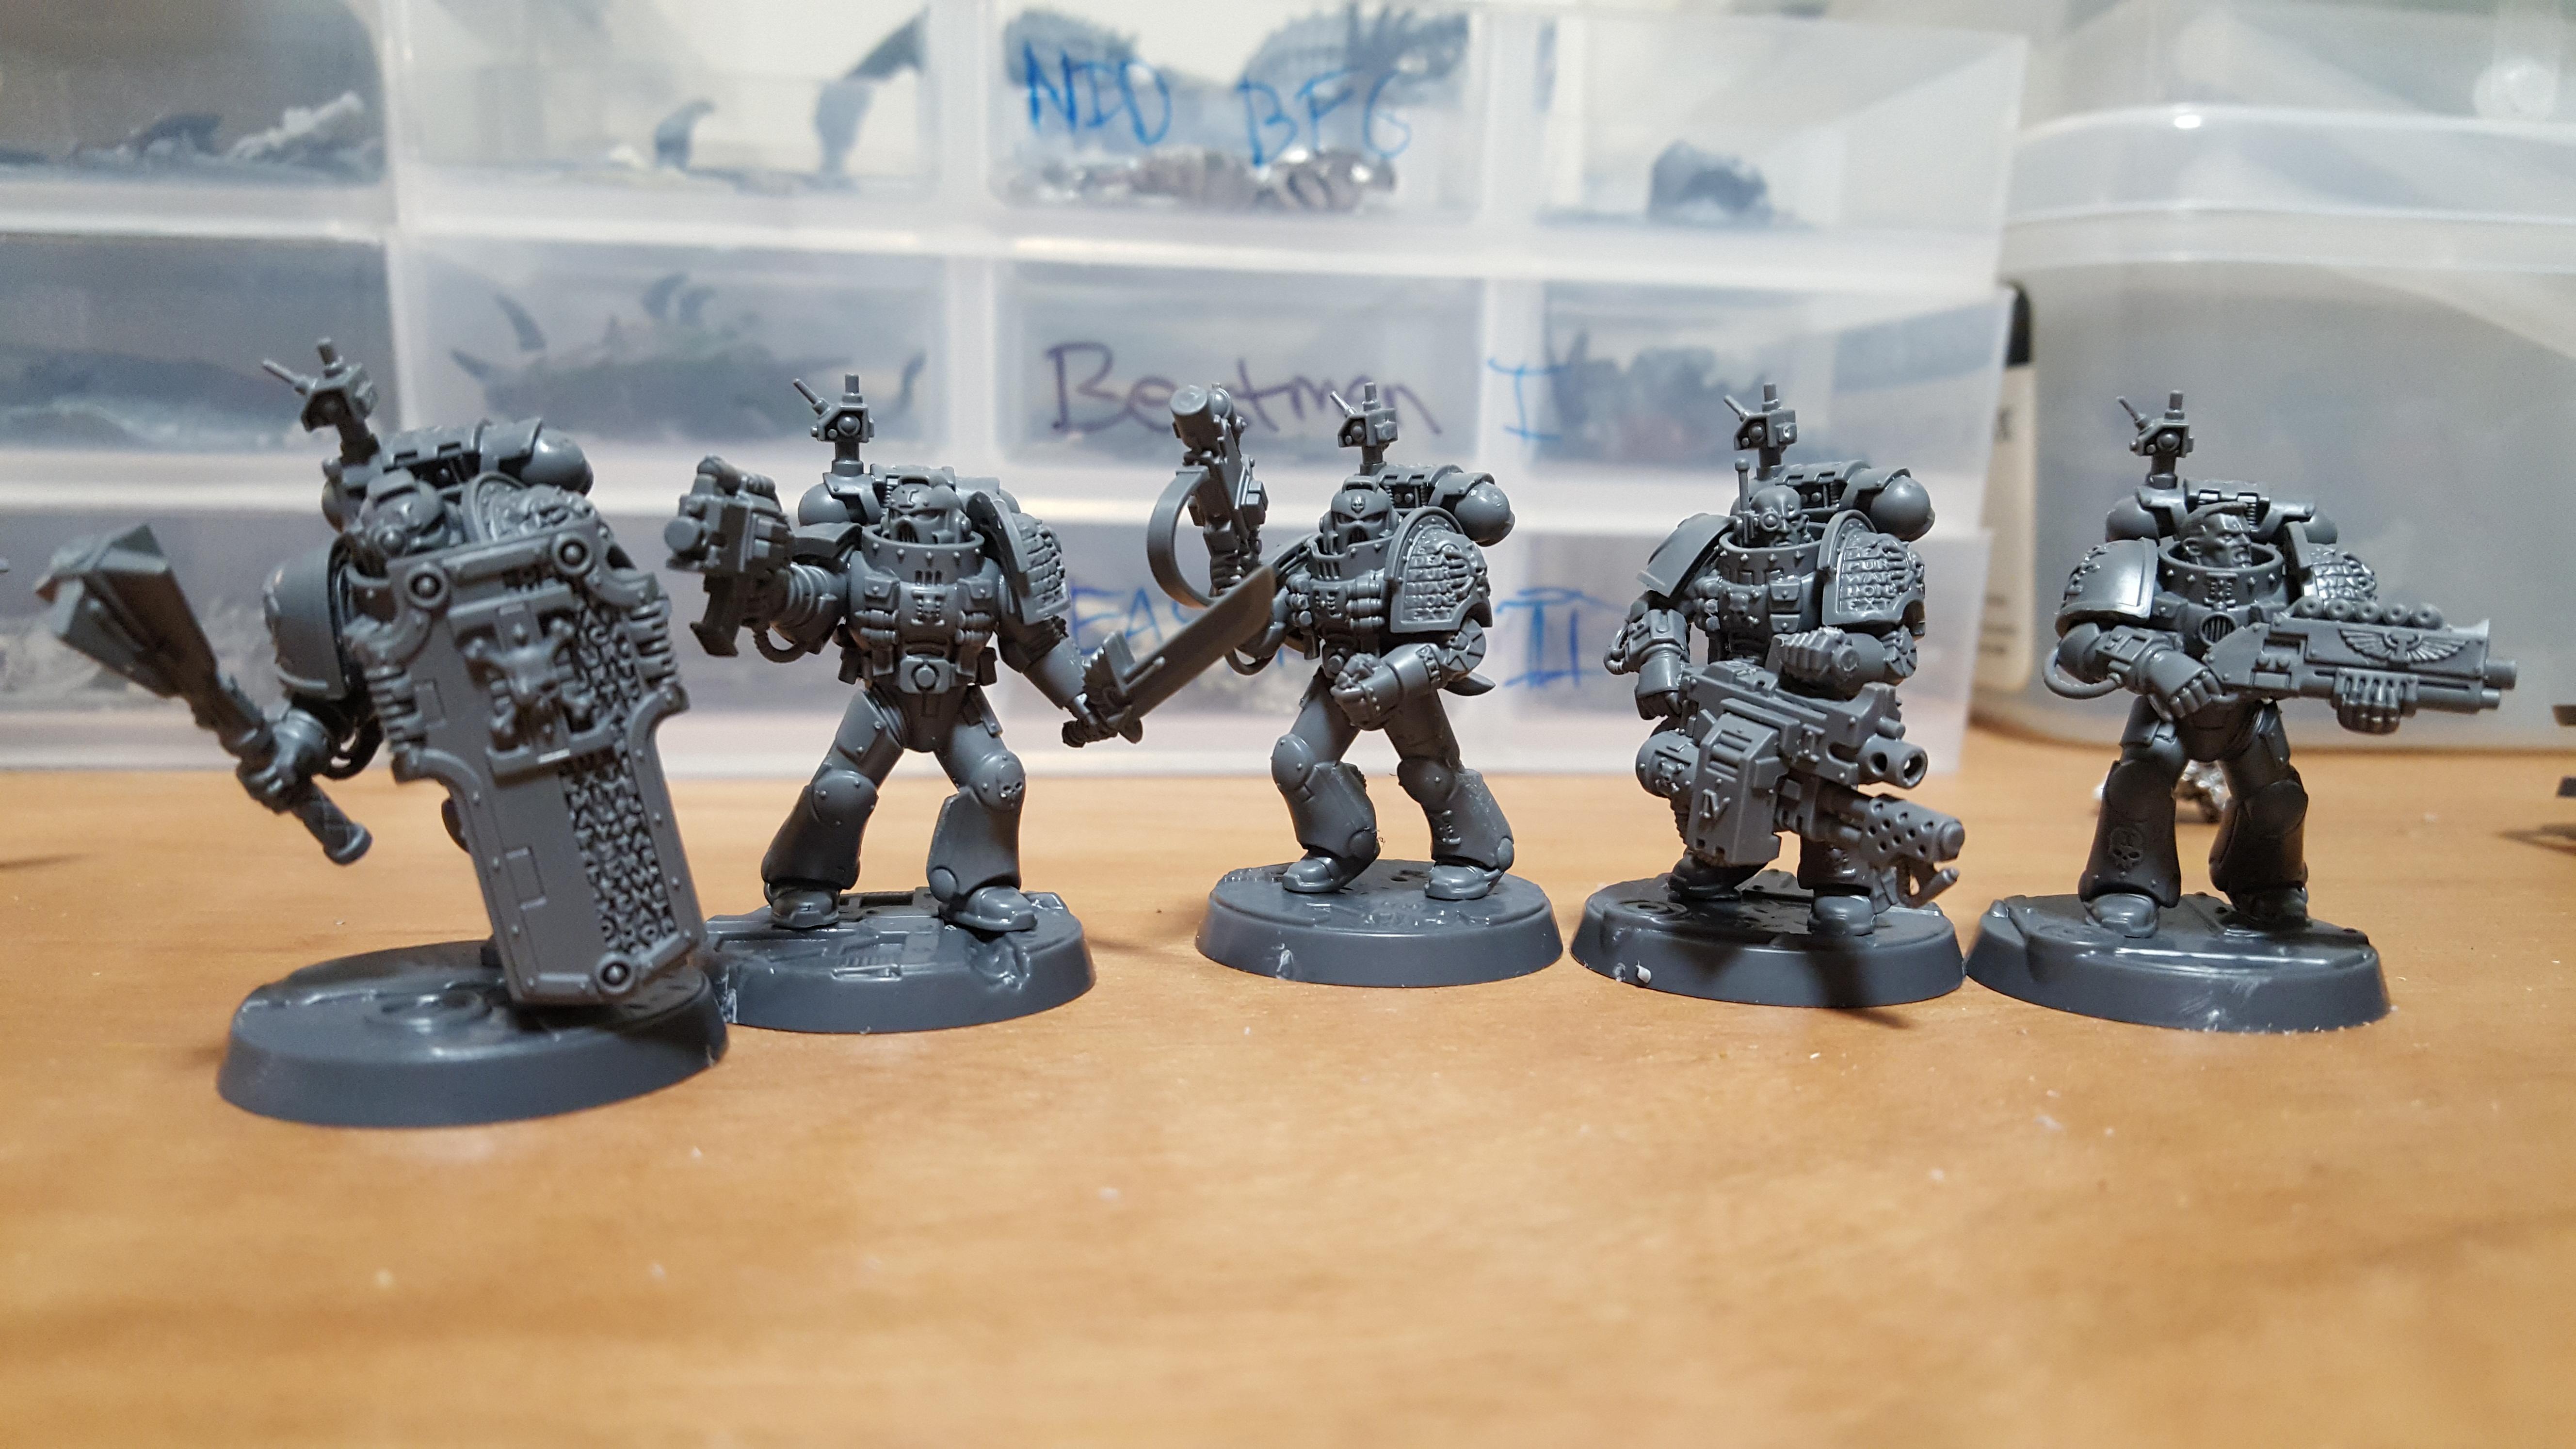 Deathwatch, Deathwatch Overkill, Kill Team Excis